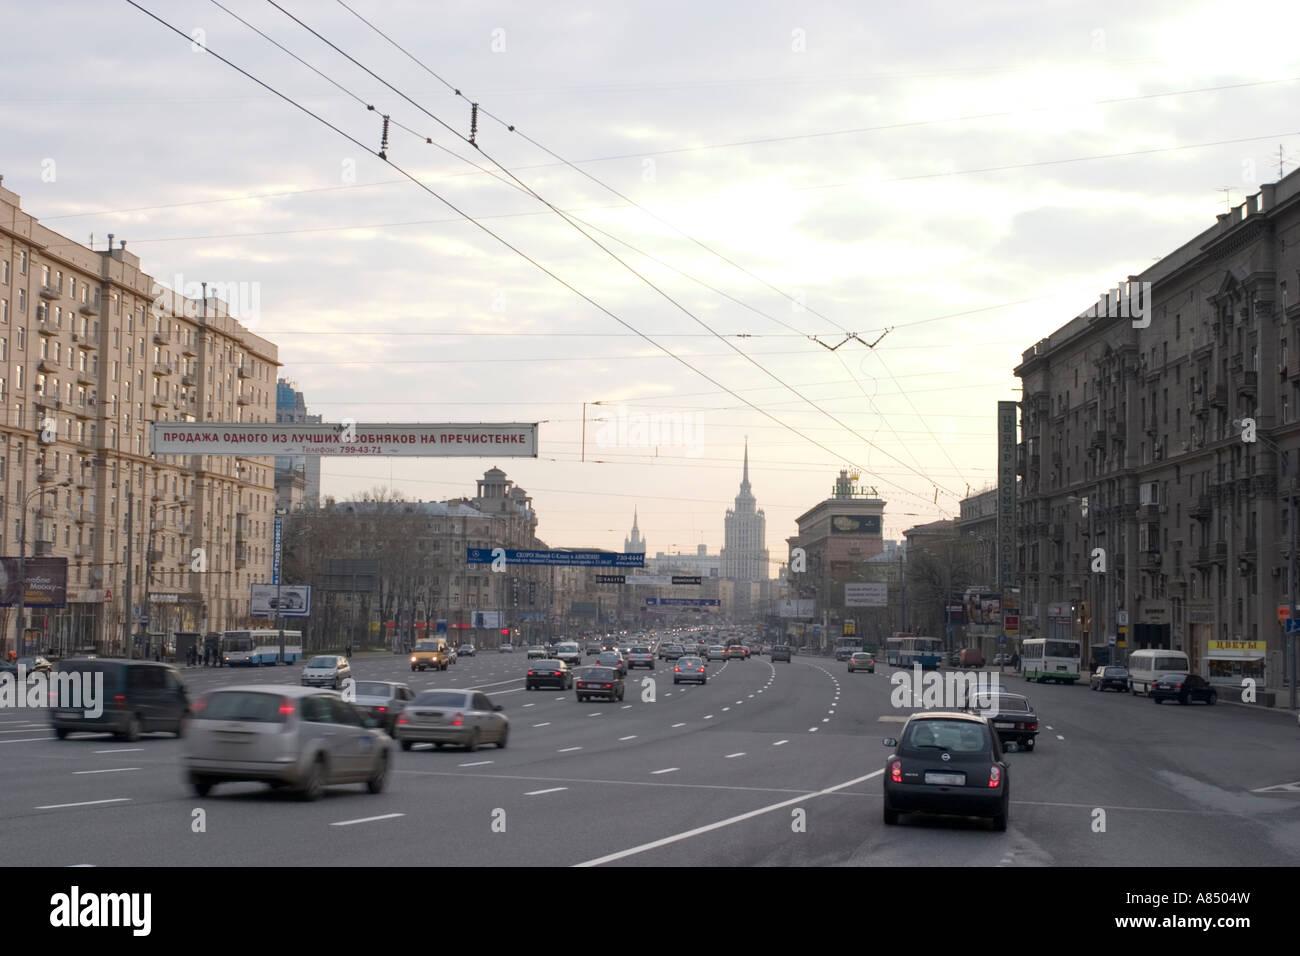 Kutuzovsky Prospekt in Moscow, Russia. - Stock Image